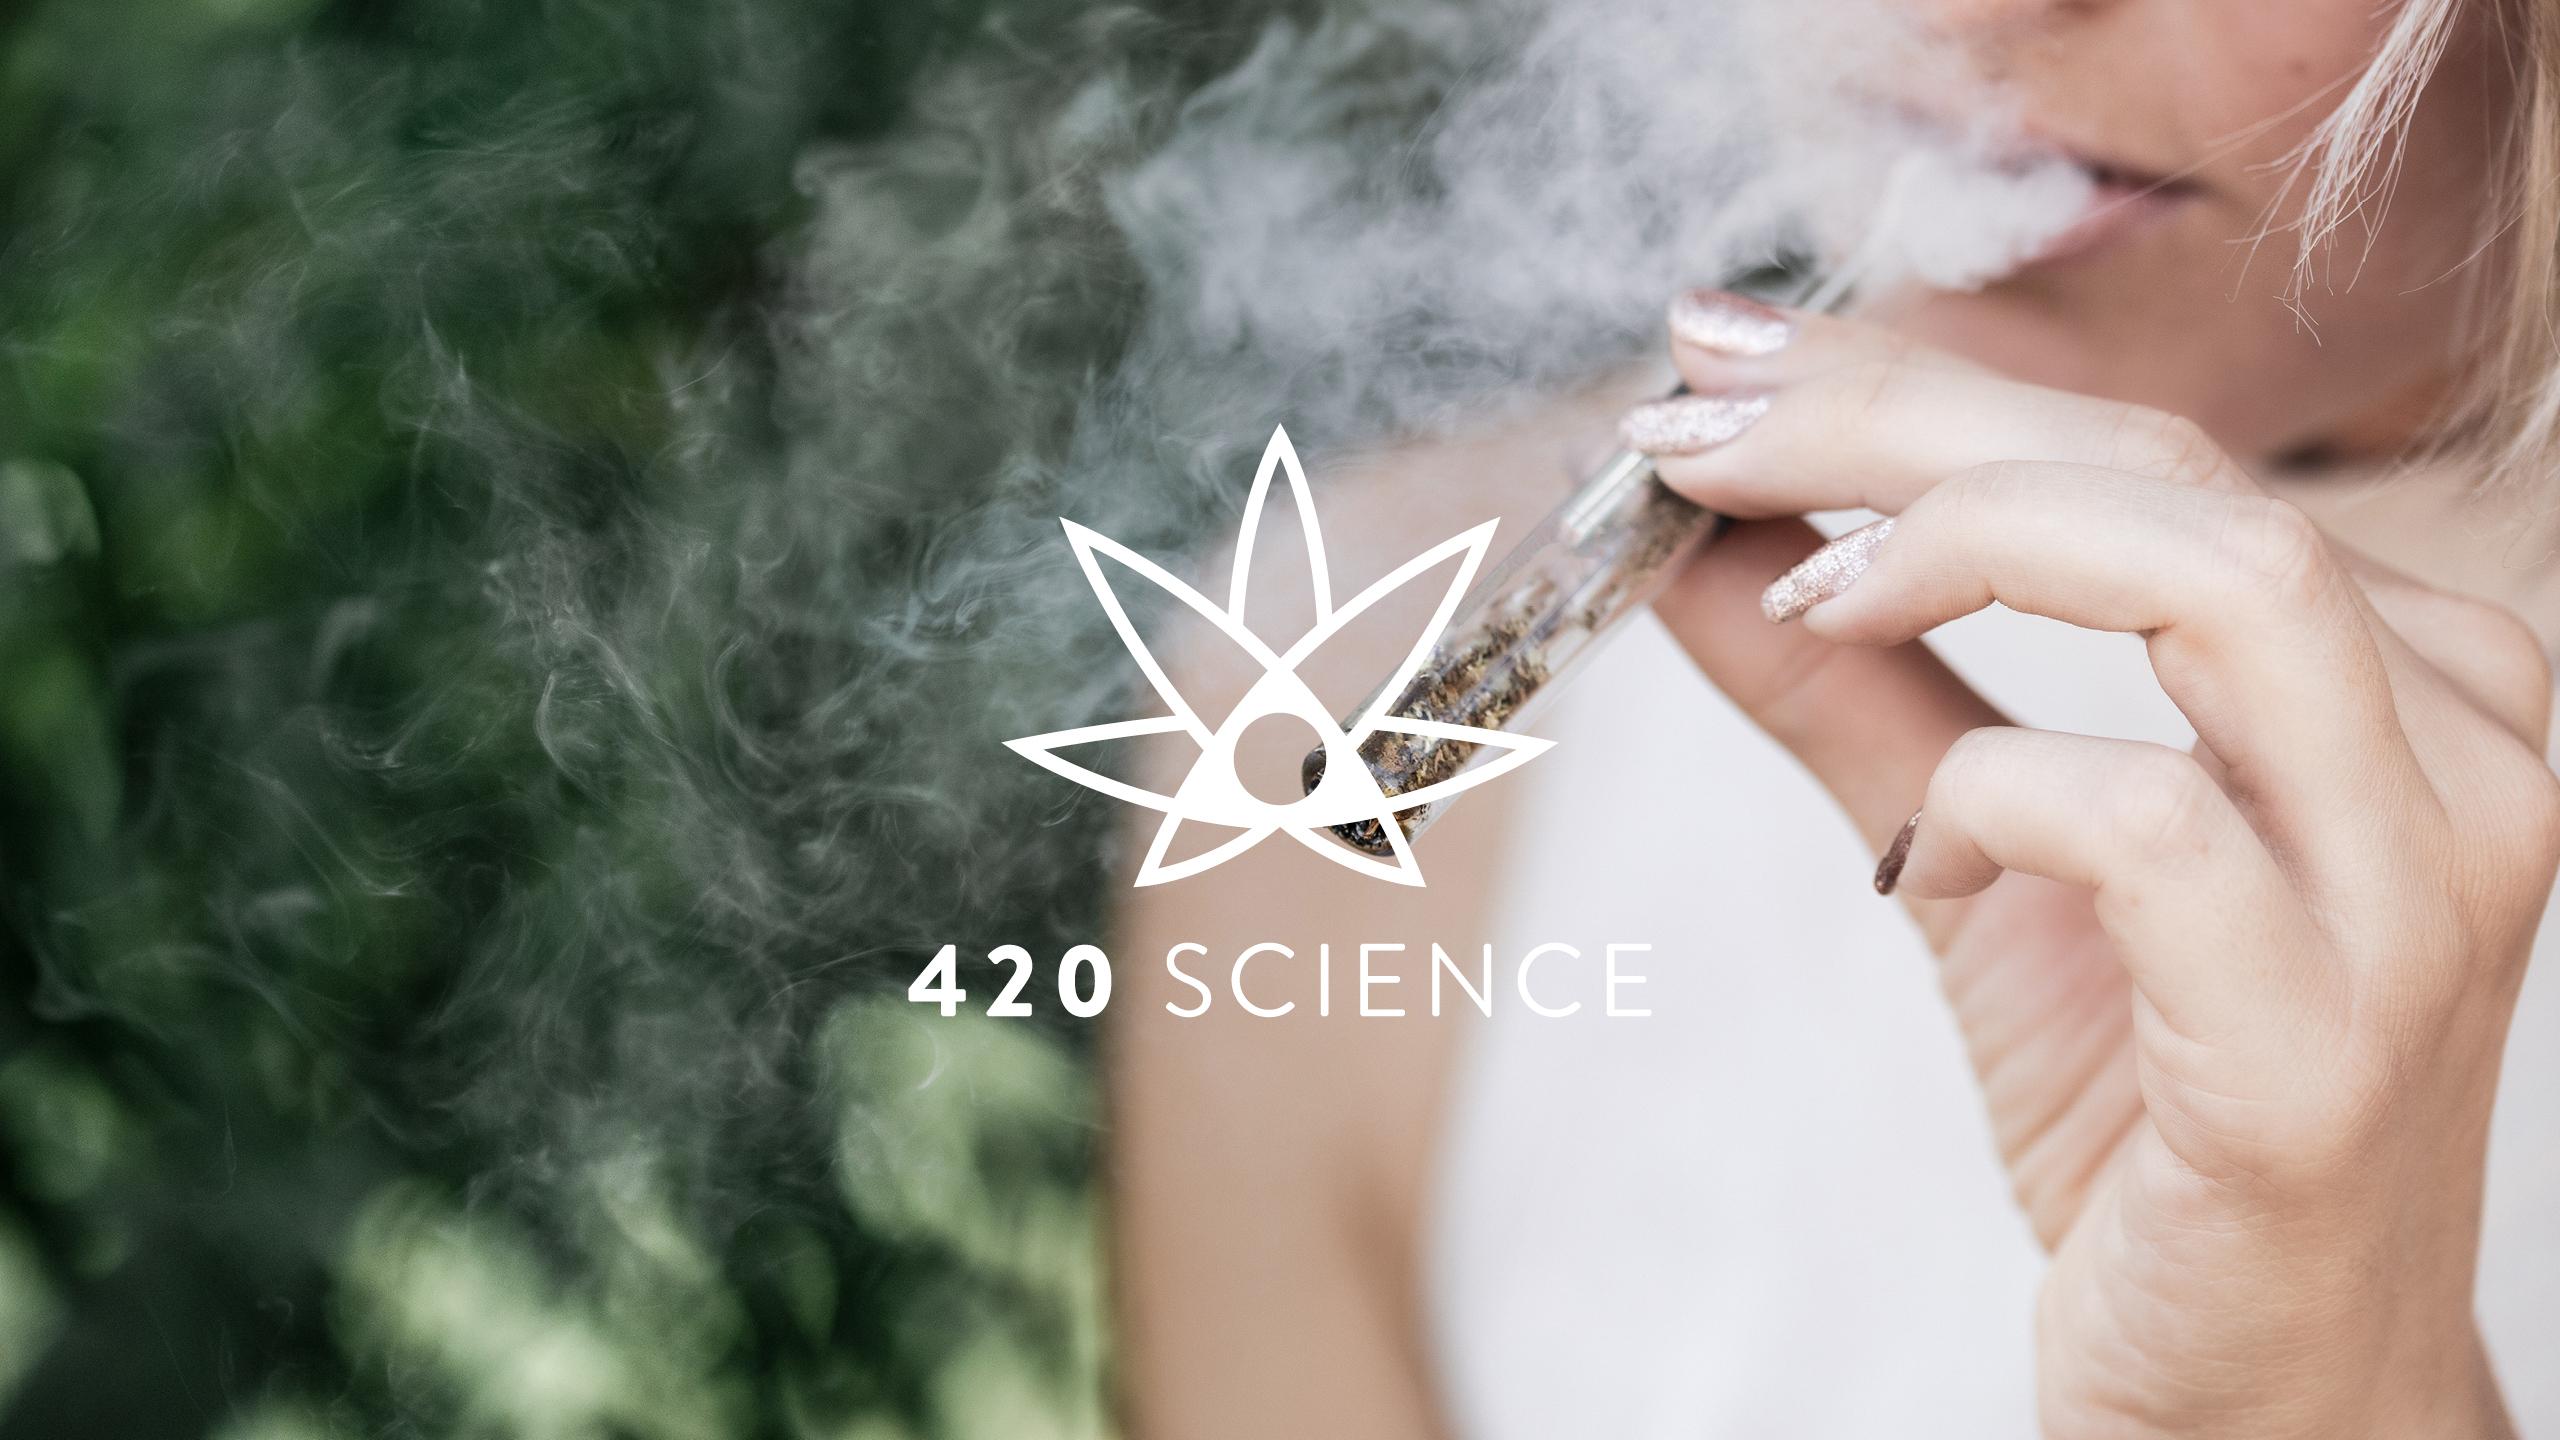 420 Science Brand Identity & Logo Creation by High Road Design Studio